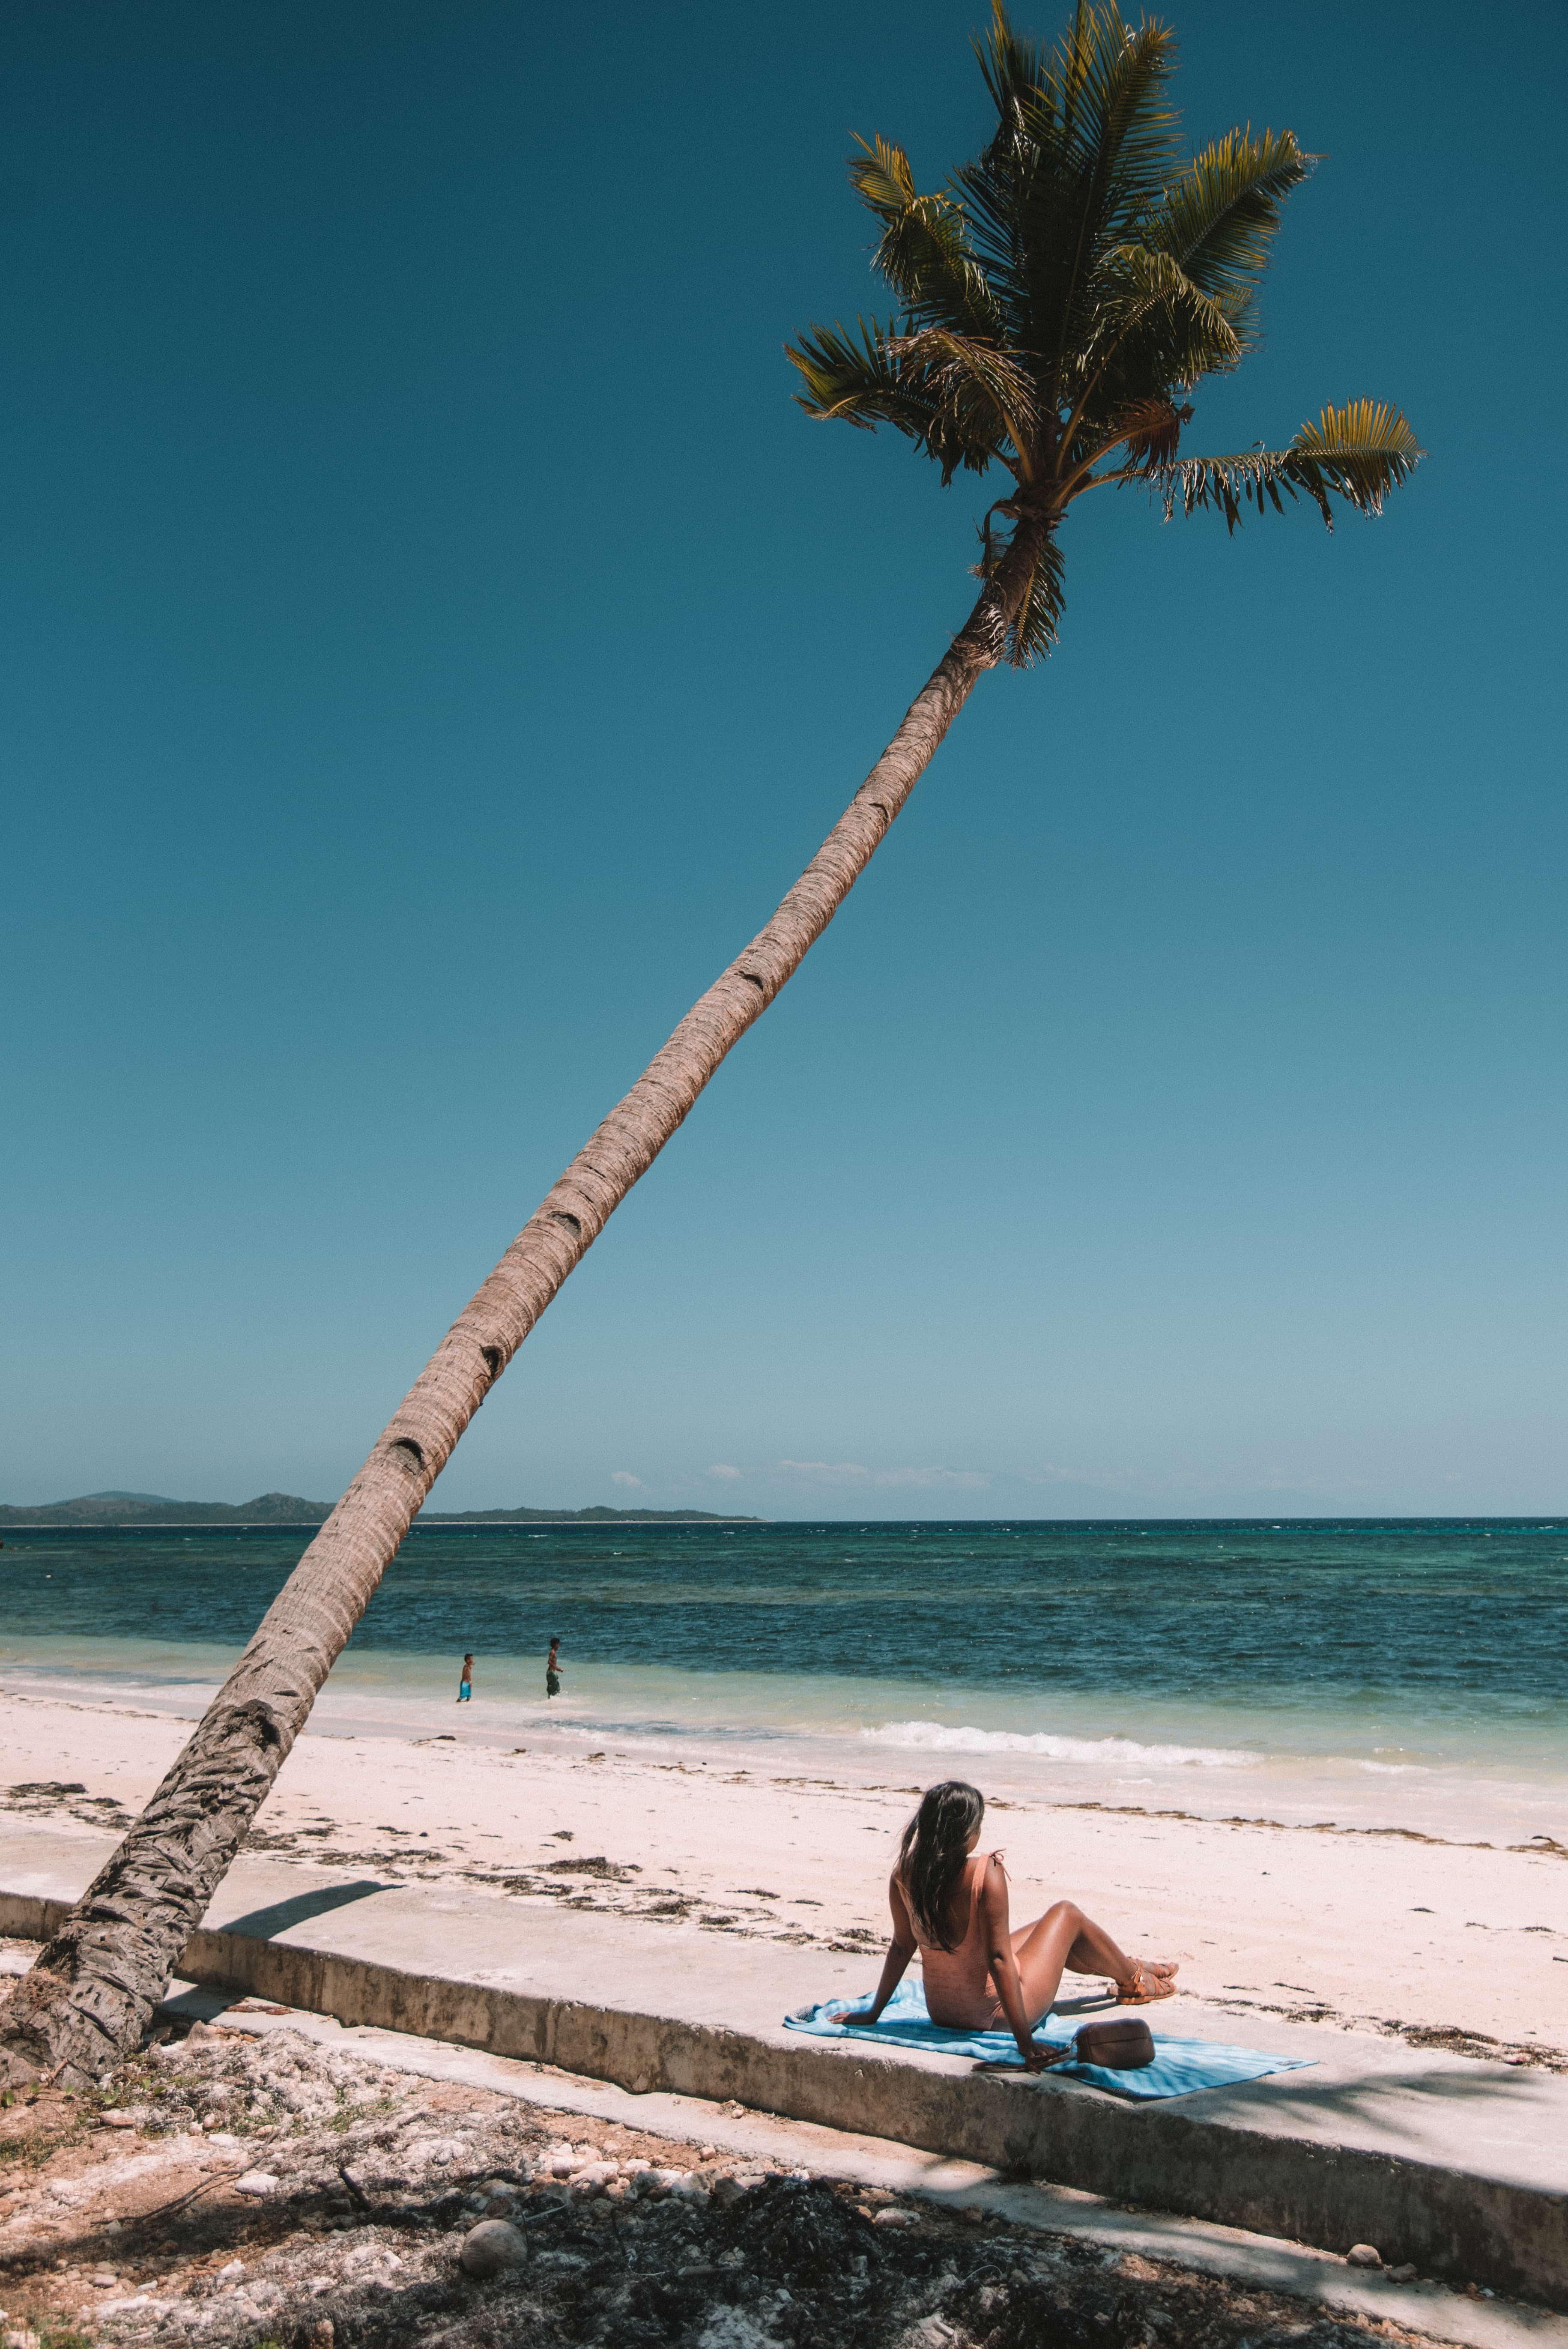 How to get to Carabao Island, Carabao Island travel guide, what to do in Carabao Island, Carabao Island, San Jose Beach